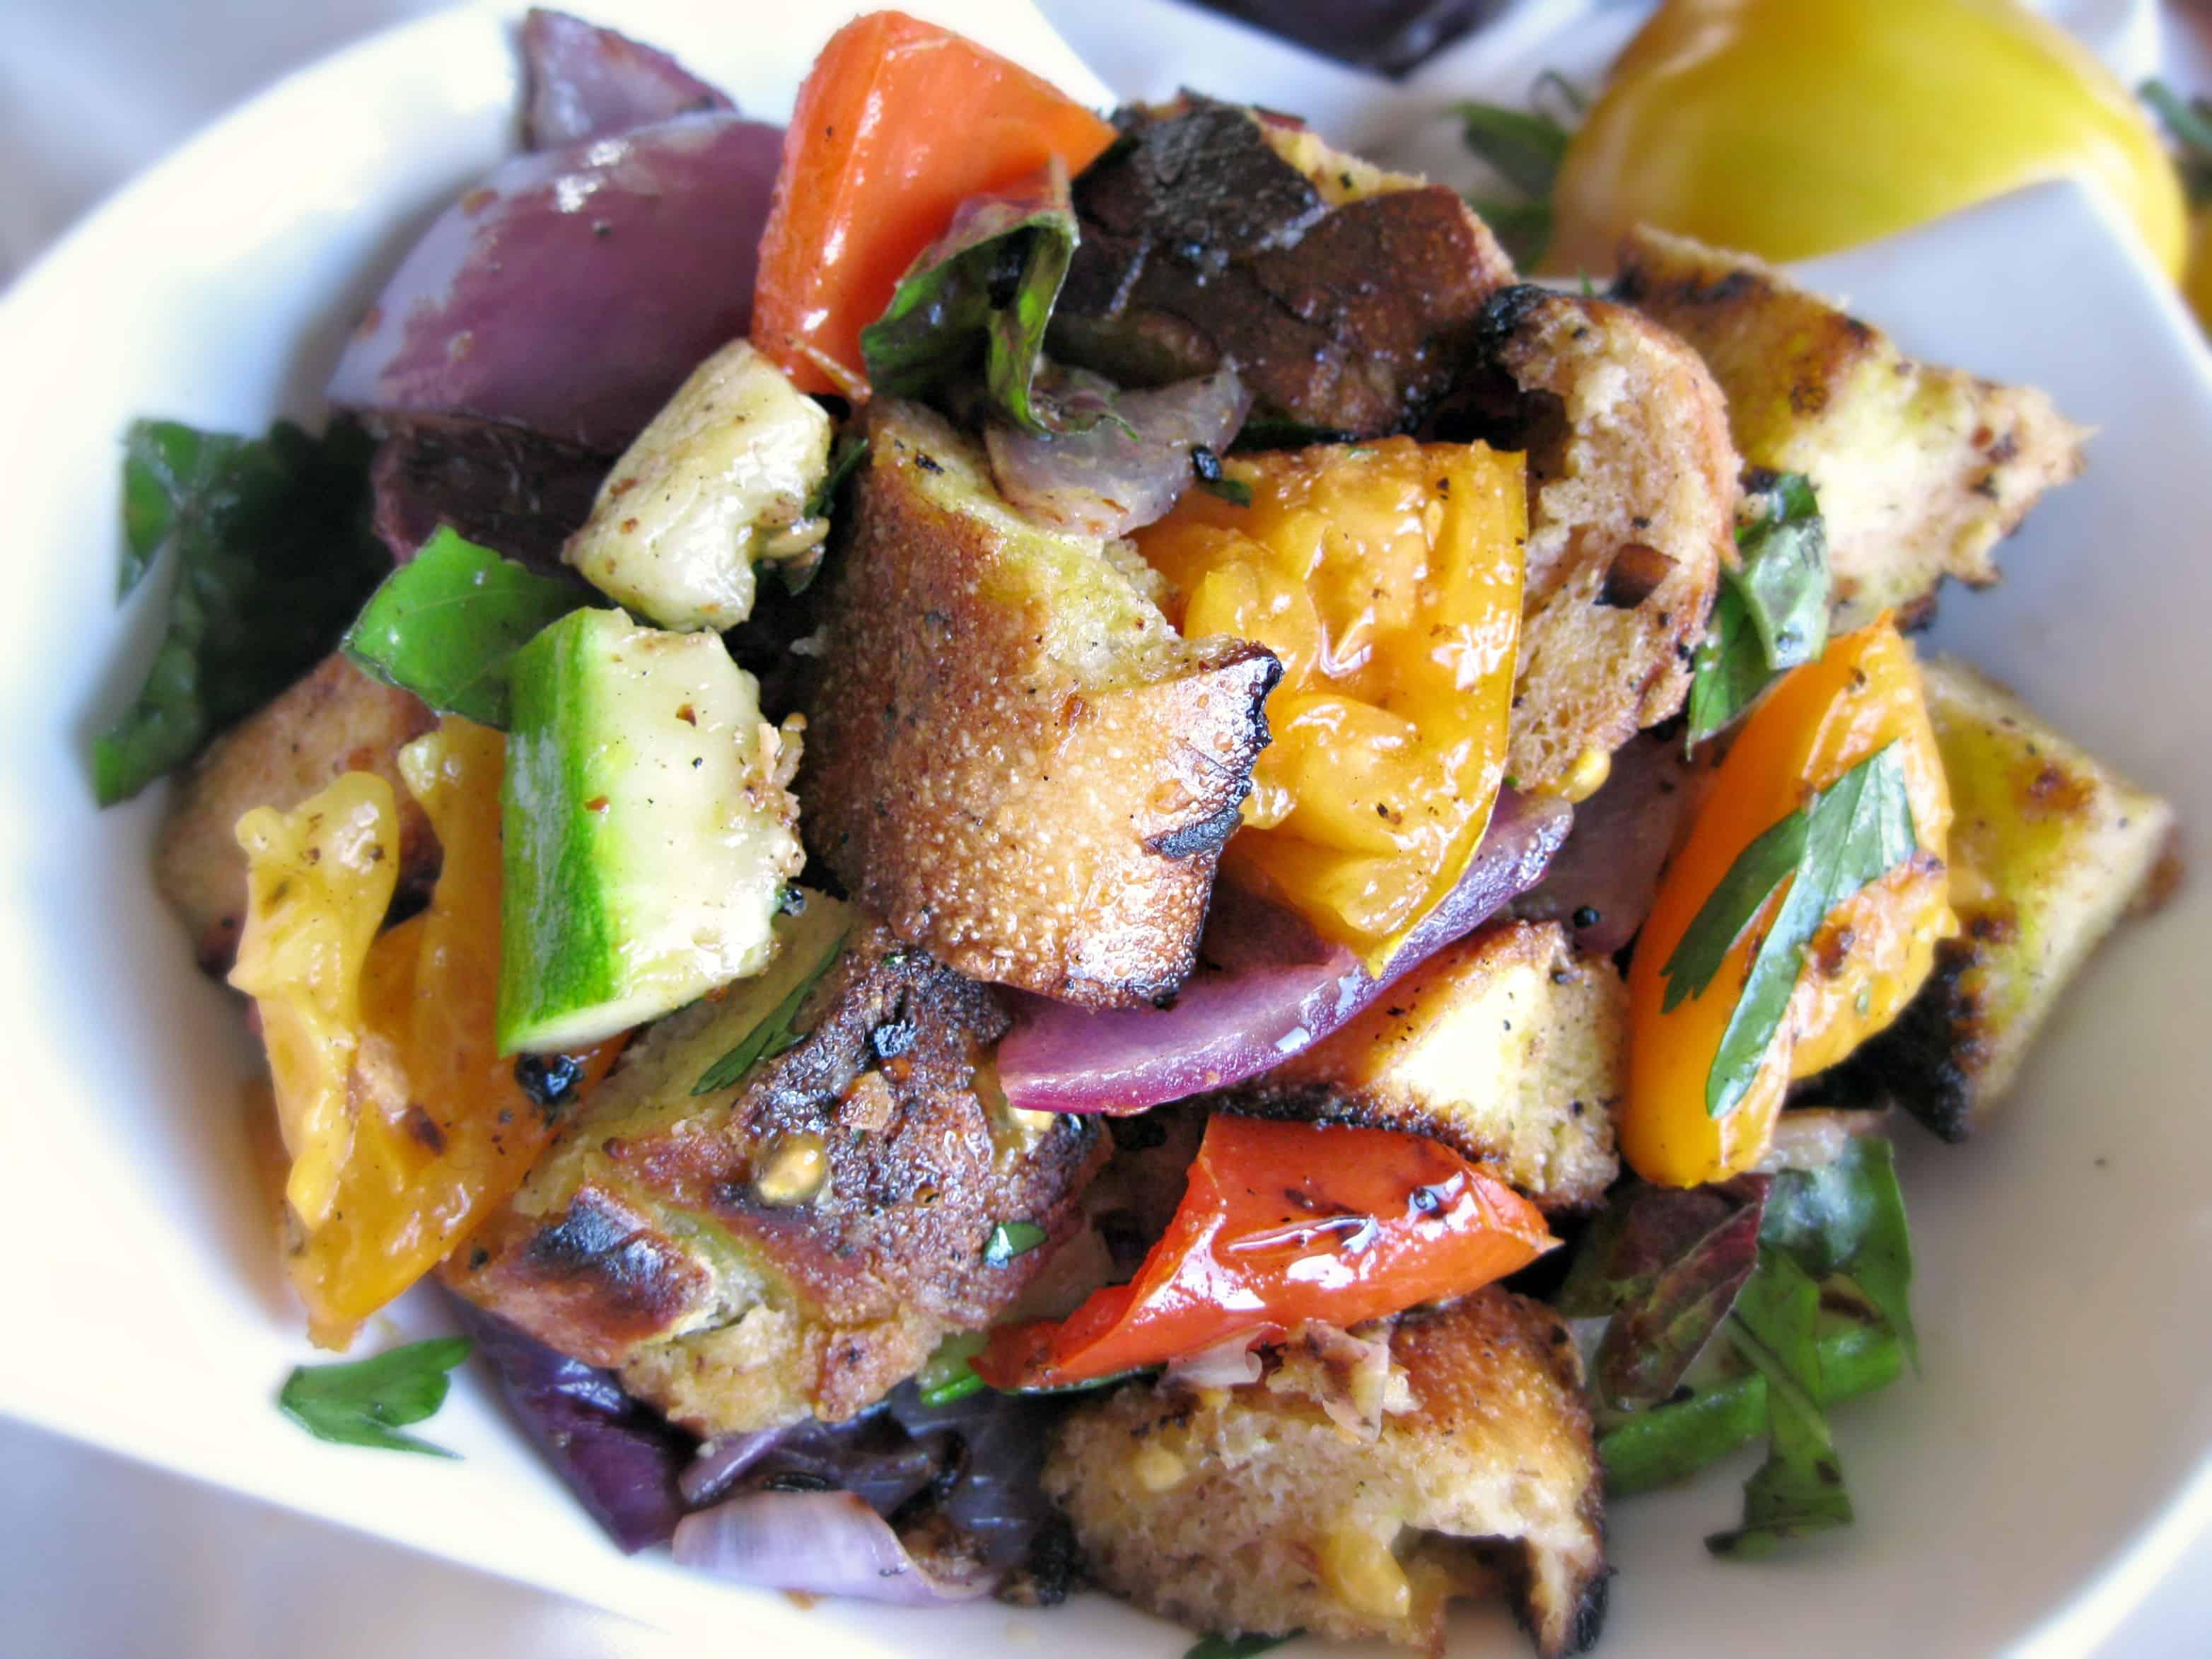 Grilled Vegetable Panzanella Recipes — Dishmaps